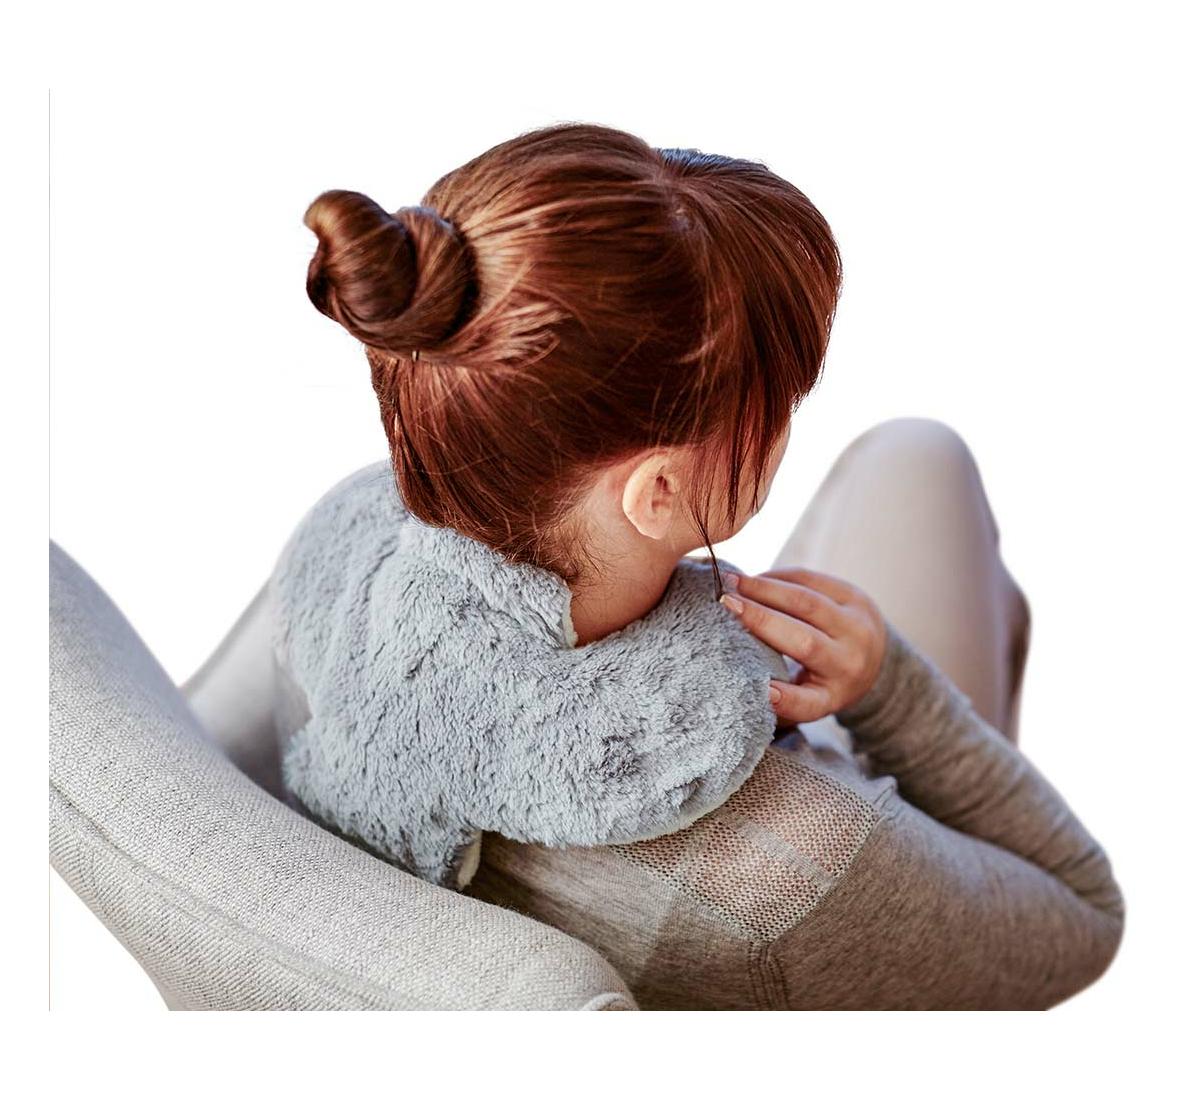 marvida care: Komfort-Nackenwärmer...